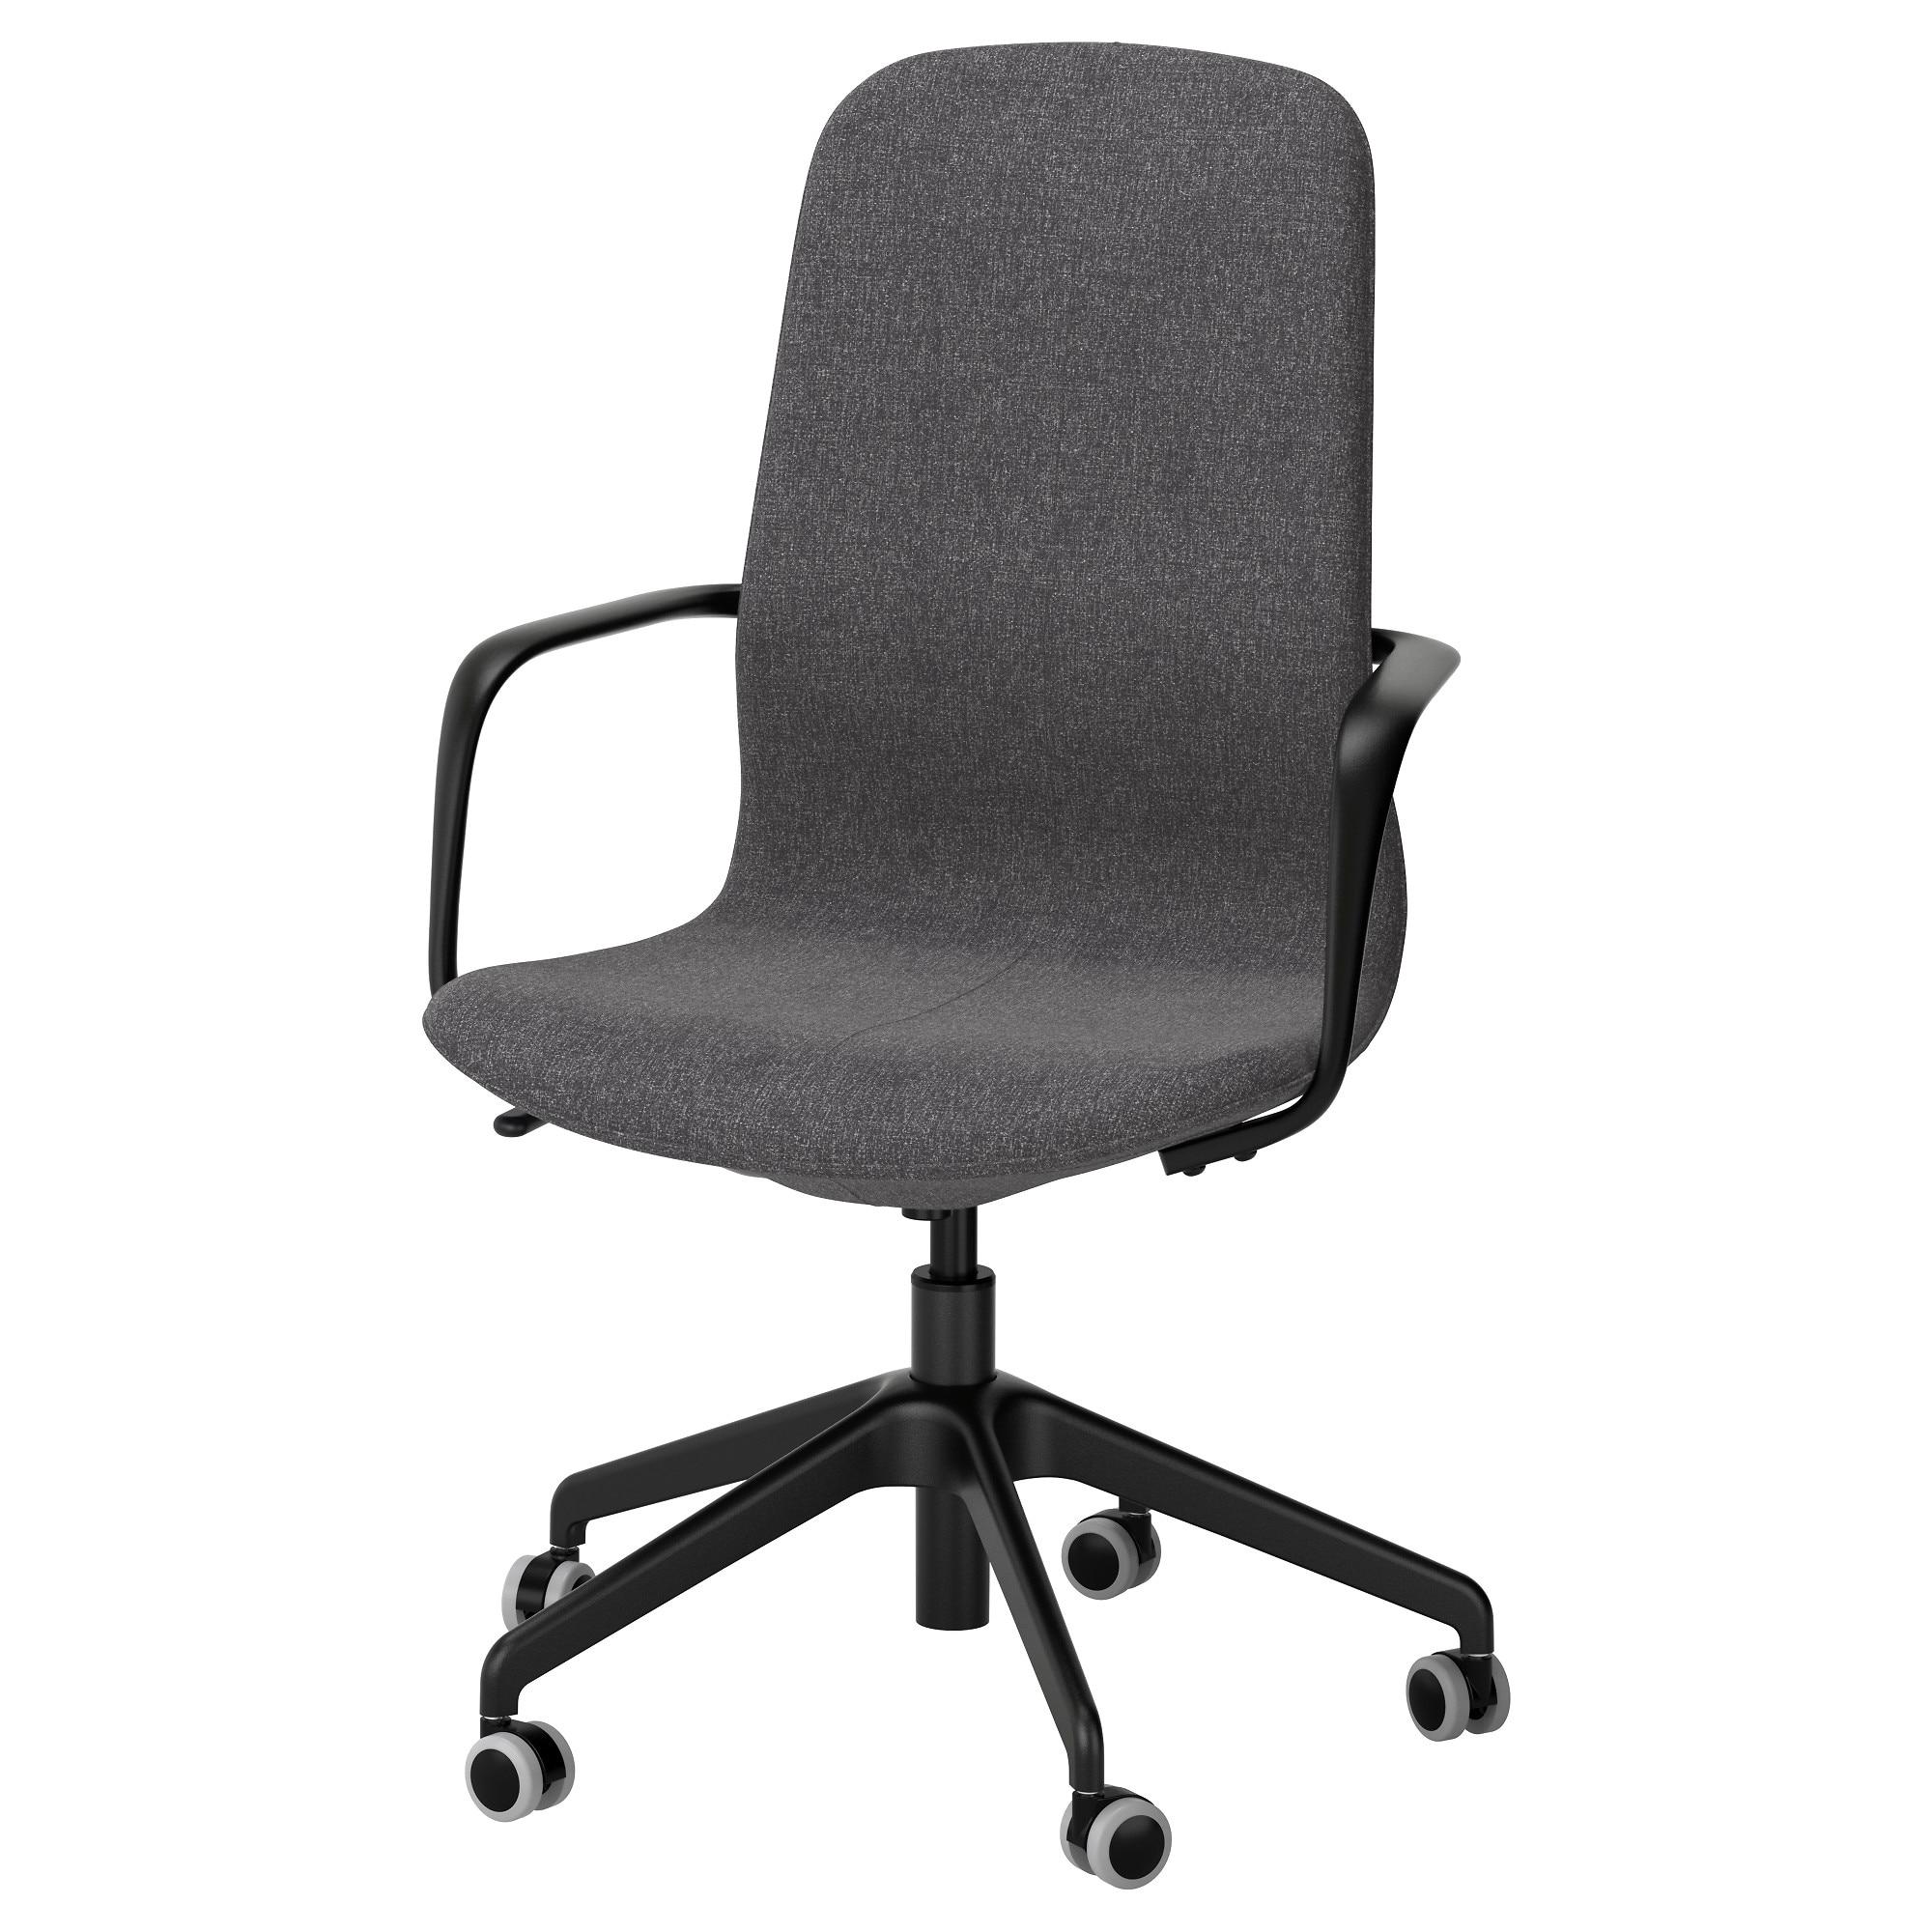 Långfjäll Swivel Chair Gunnared Dark Grey/black – Ikea Intended For Dark Grey Swivel Chairs (Image 13 of 20)